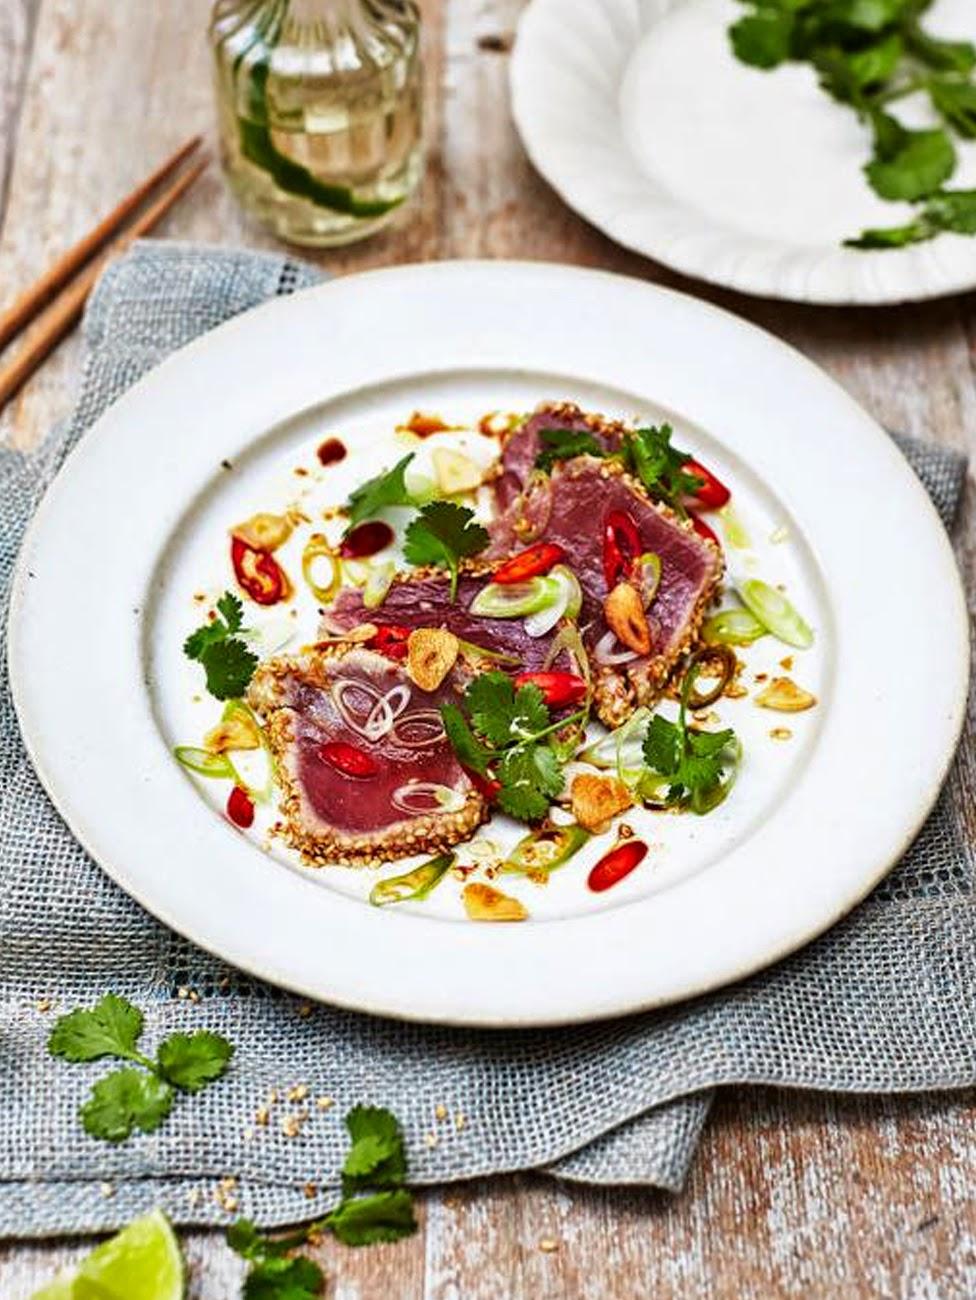 Jamie Oliver 10 Healthy Meals